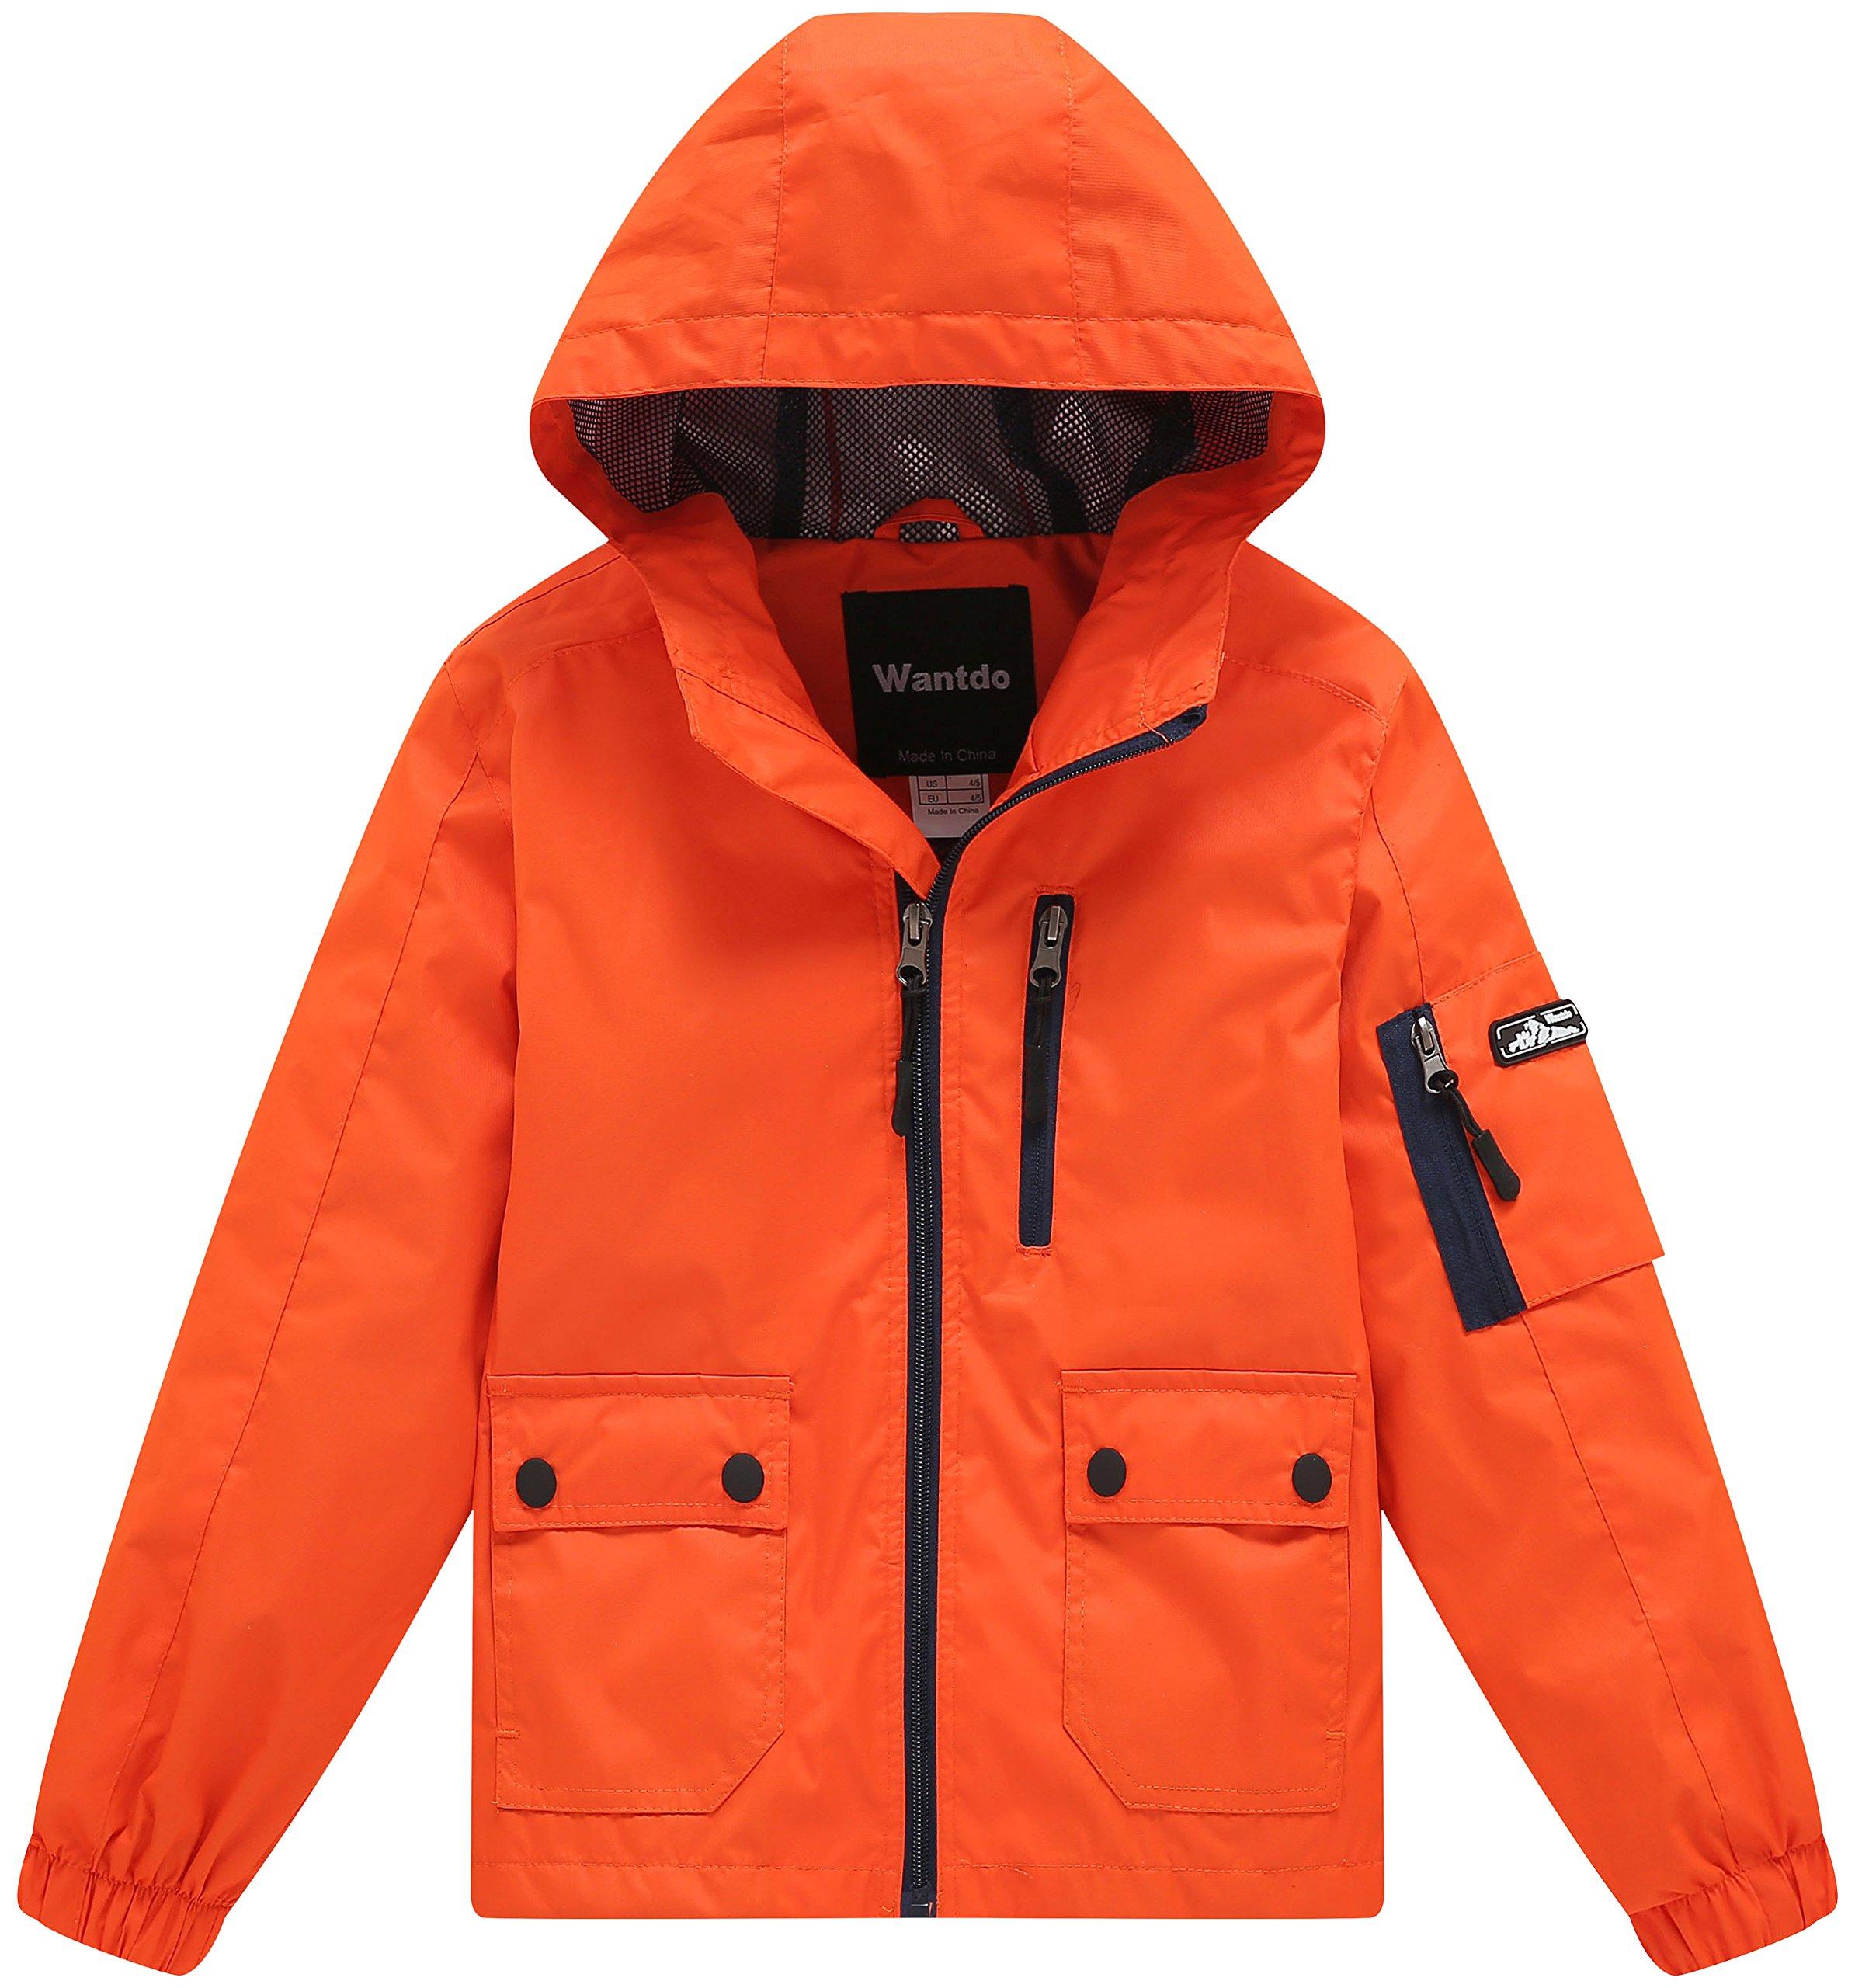 ab4aa44ba Wantdo Boy's Ultra Light Packable Travel Jacket Outdoor Windcheater Zipped  Hoodies for Running(Lily Orange Yellow, 10/12)